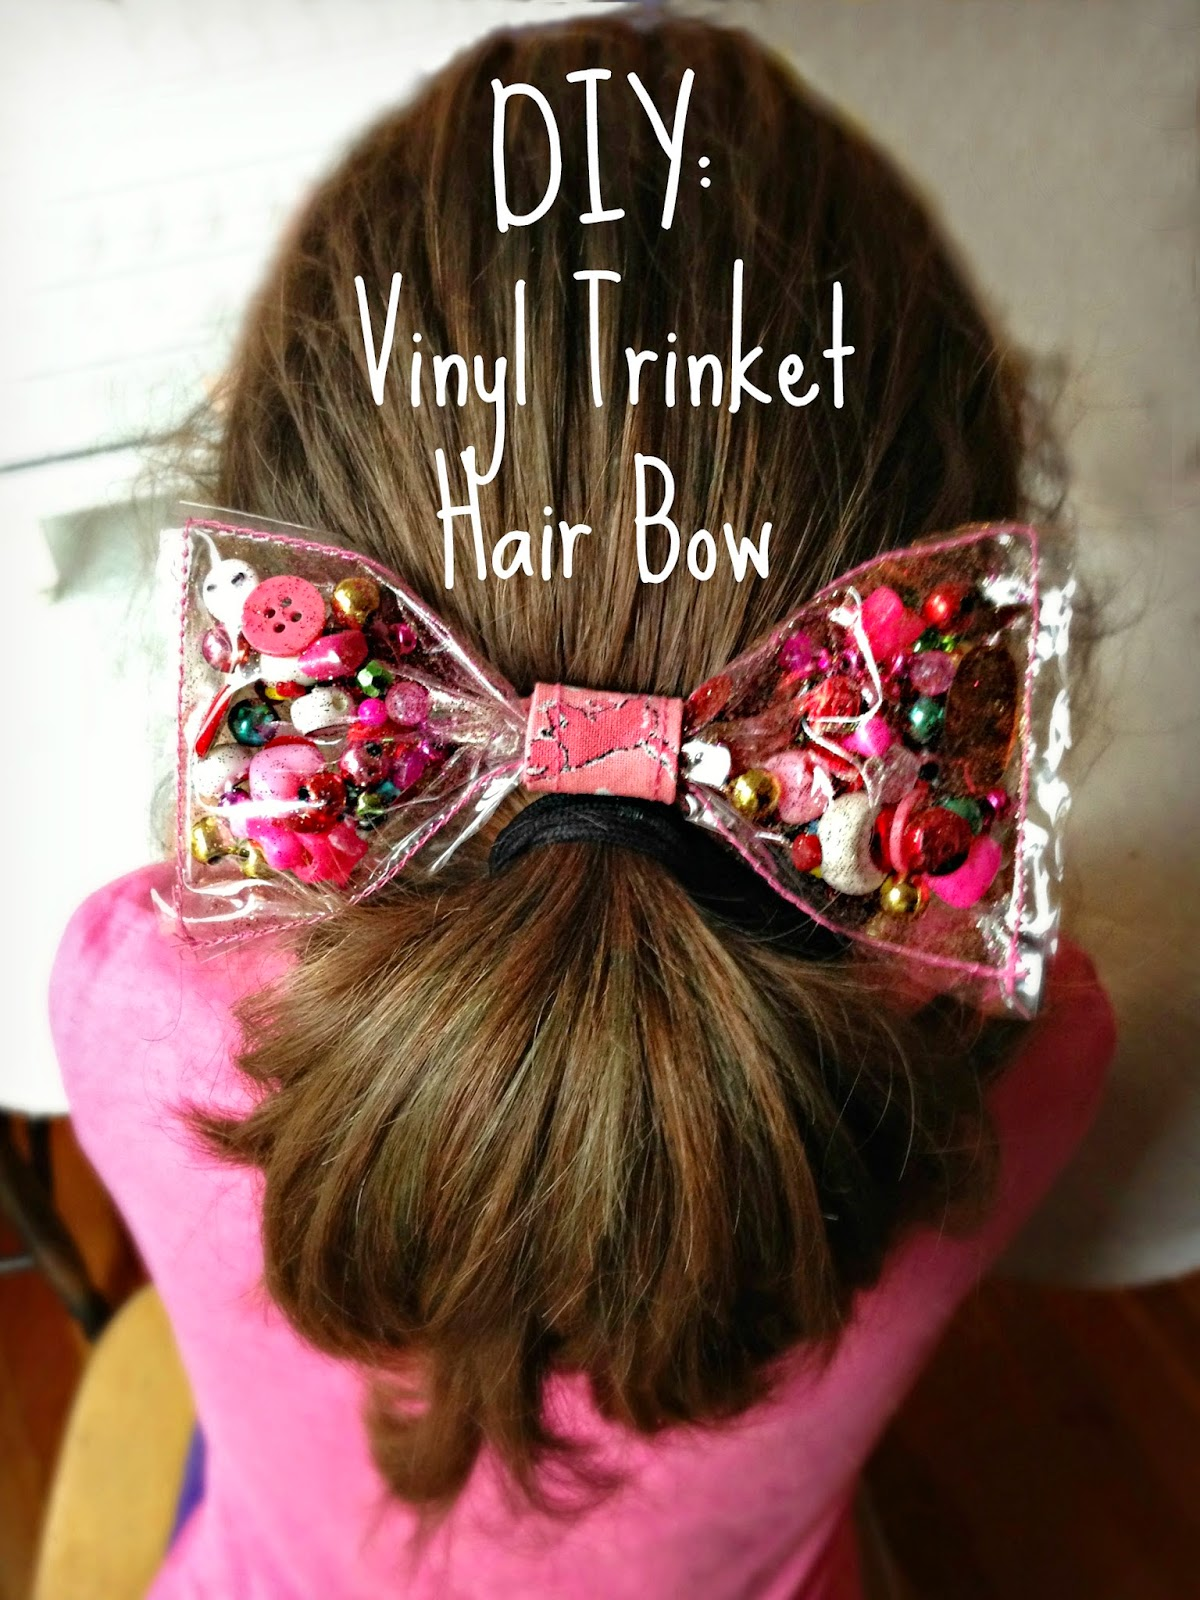 Whimsy Love Diy Vinyl Trinket Hair Bow